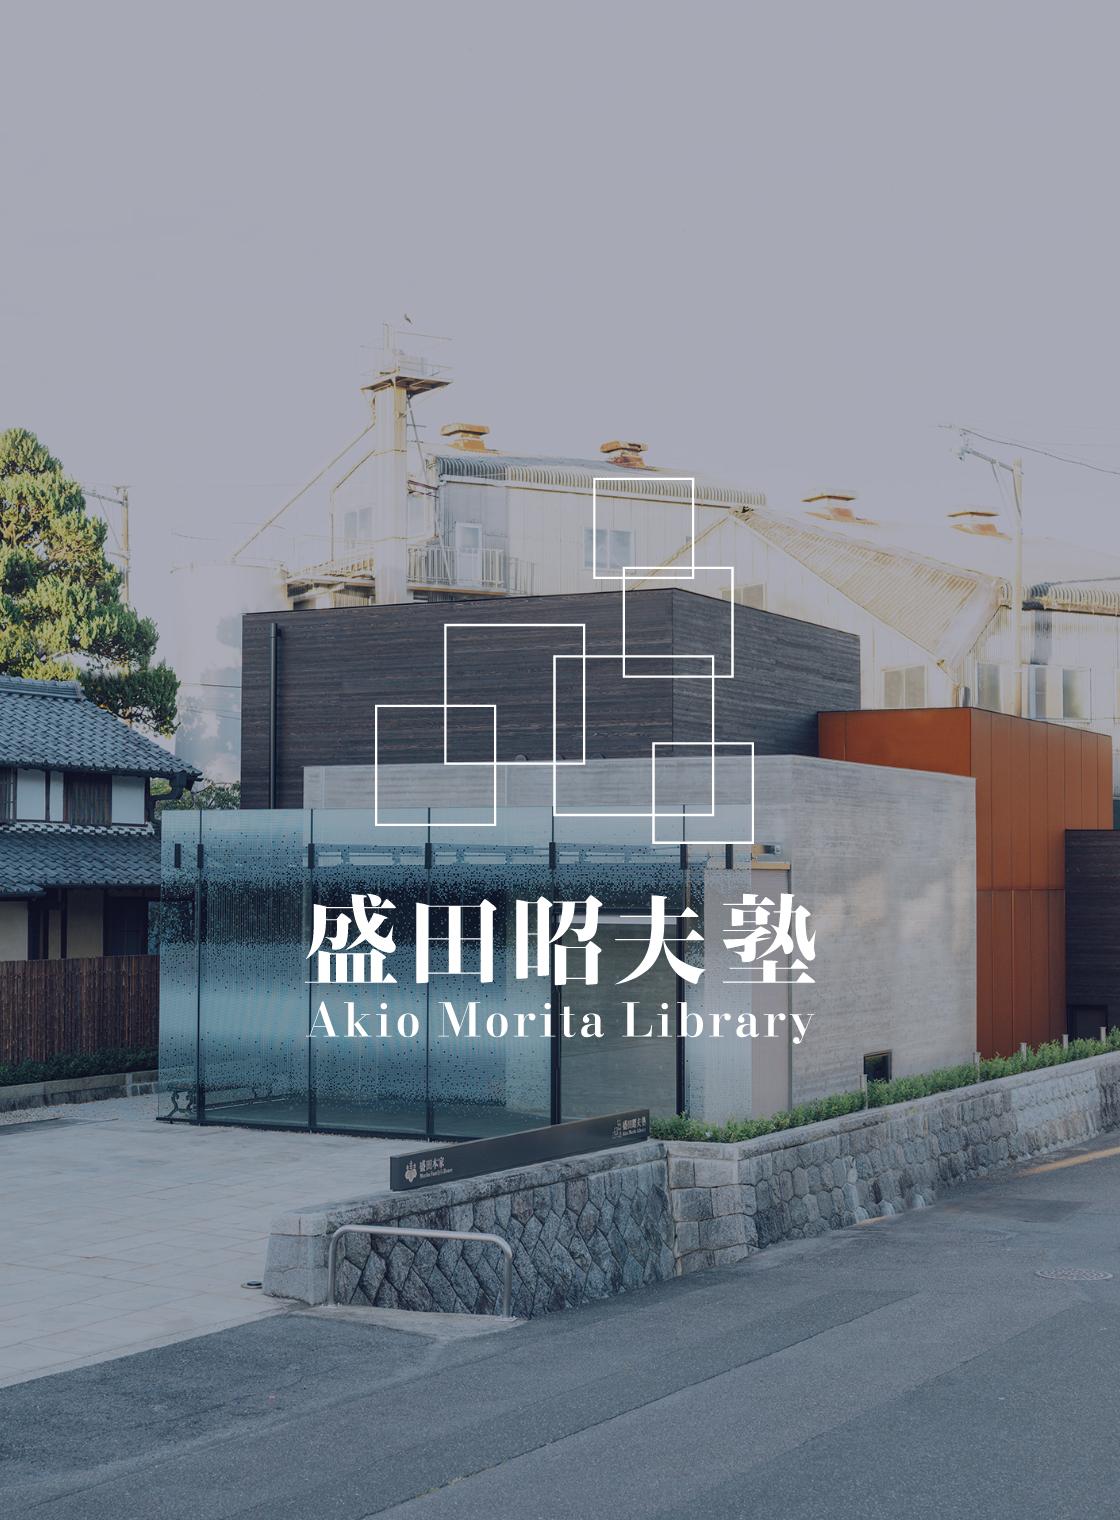 Akio Morita Library